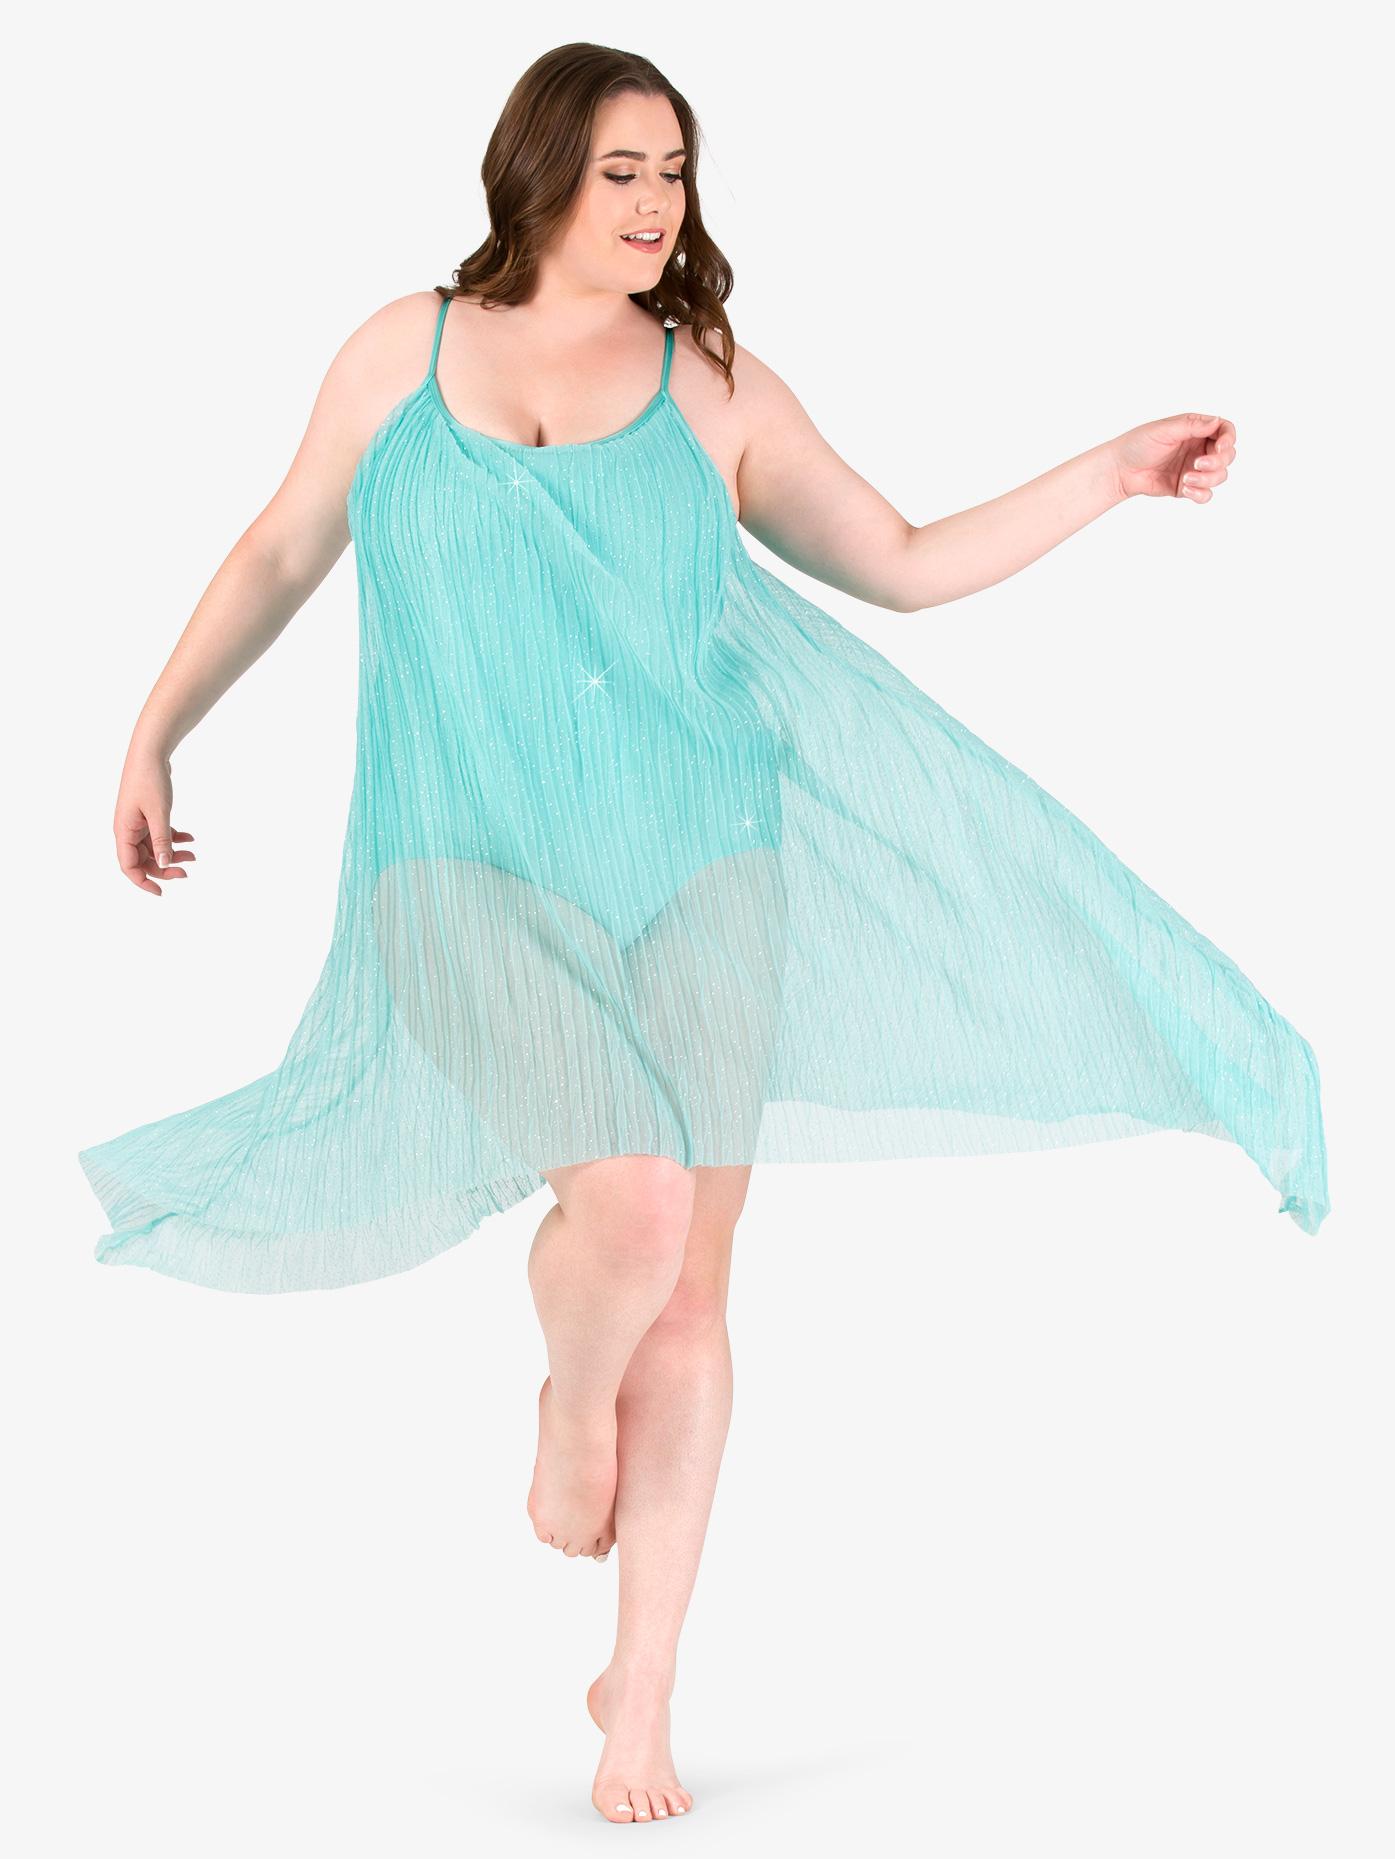 Elisse by Double Platinum Womens Plus Size Glitter Mesh Camisole Performance Dress N7473P